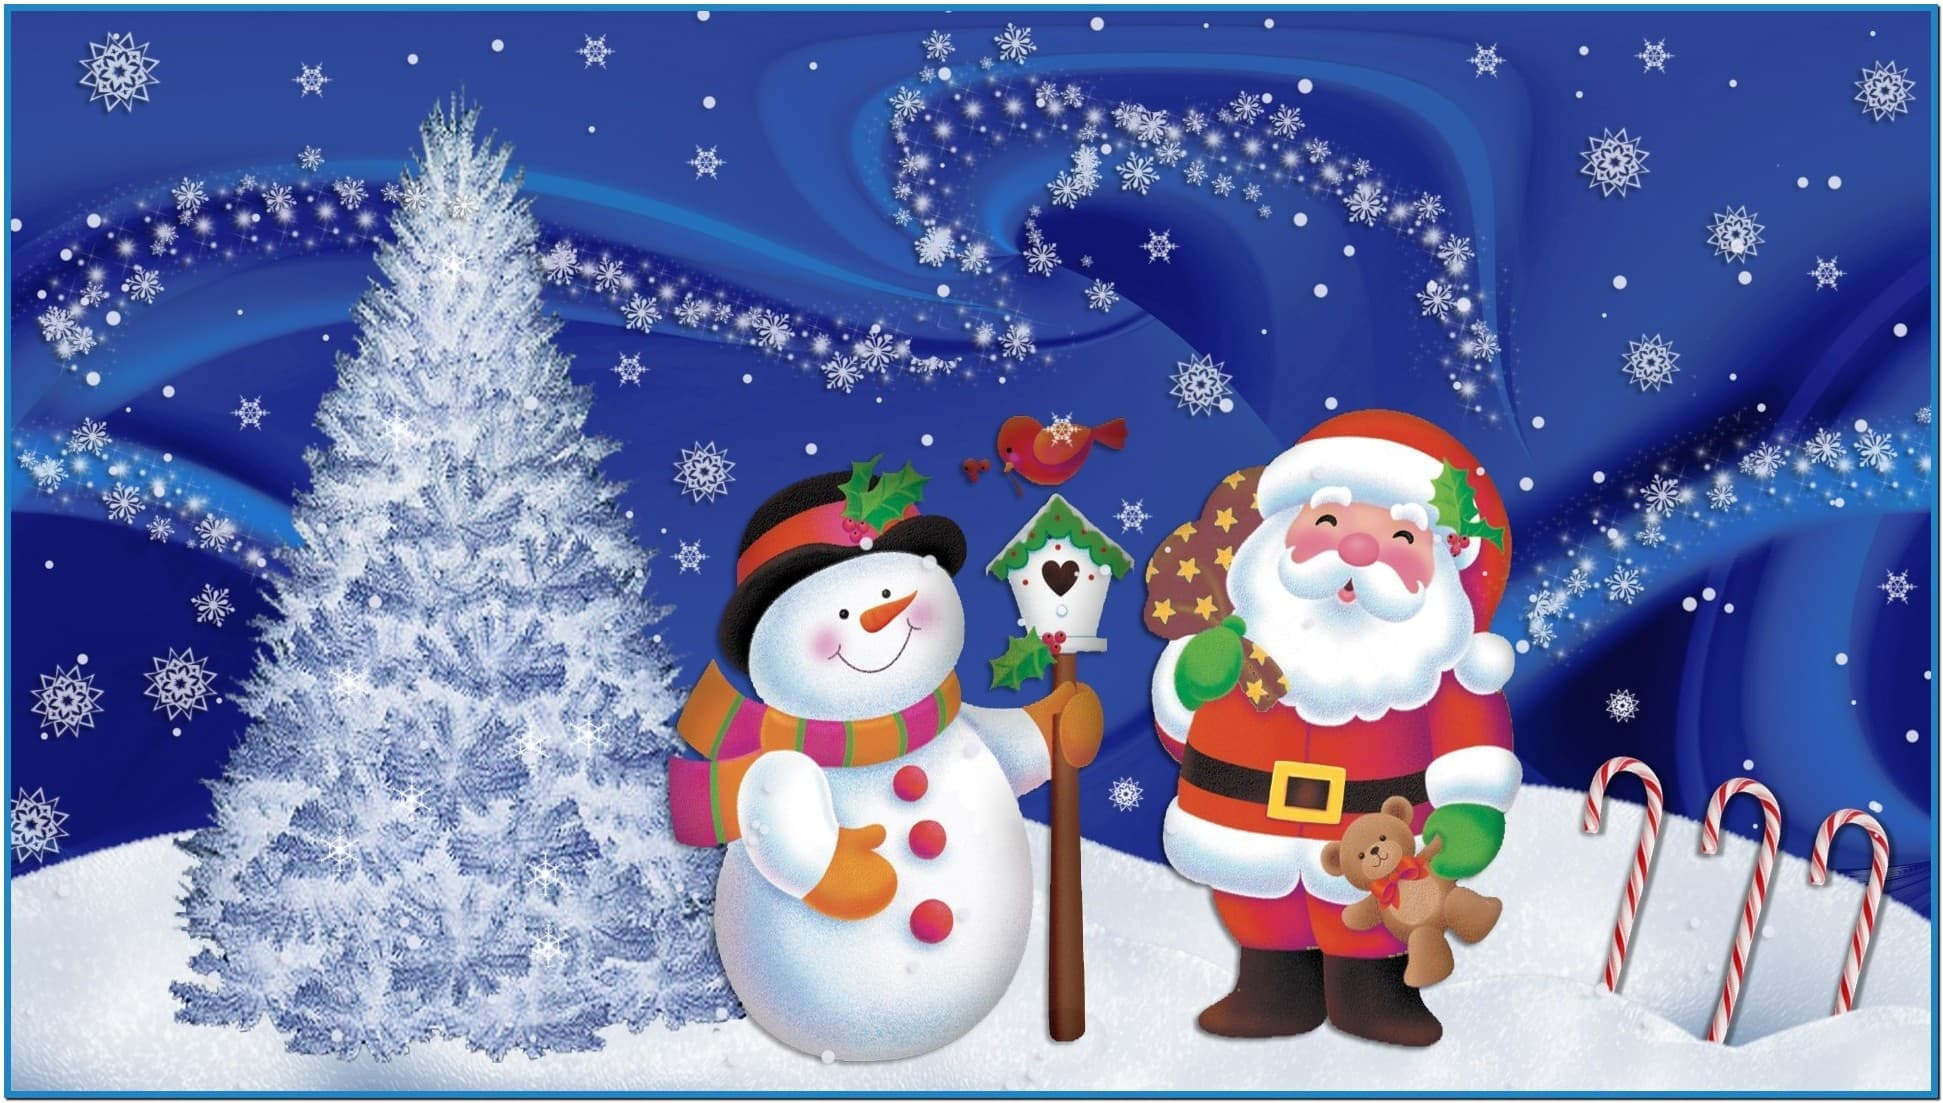 Christmas wallpapers and screensavers   Download 1943x1103